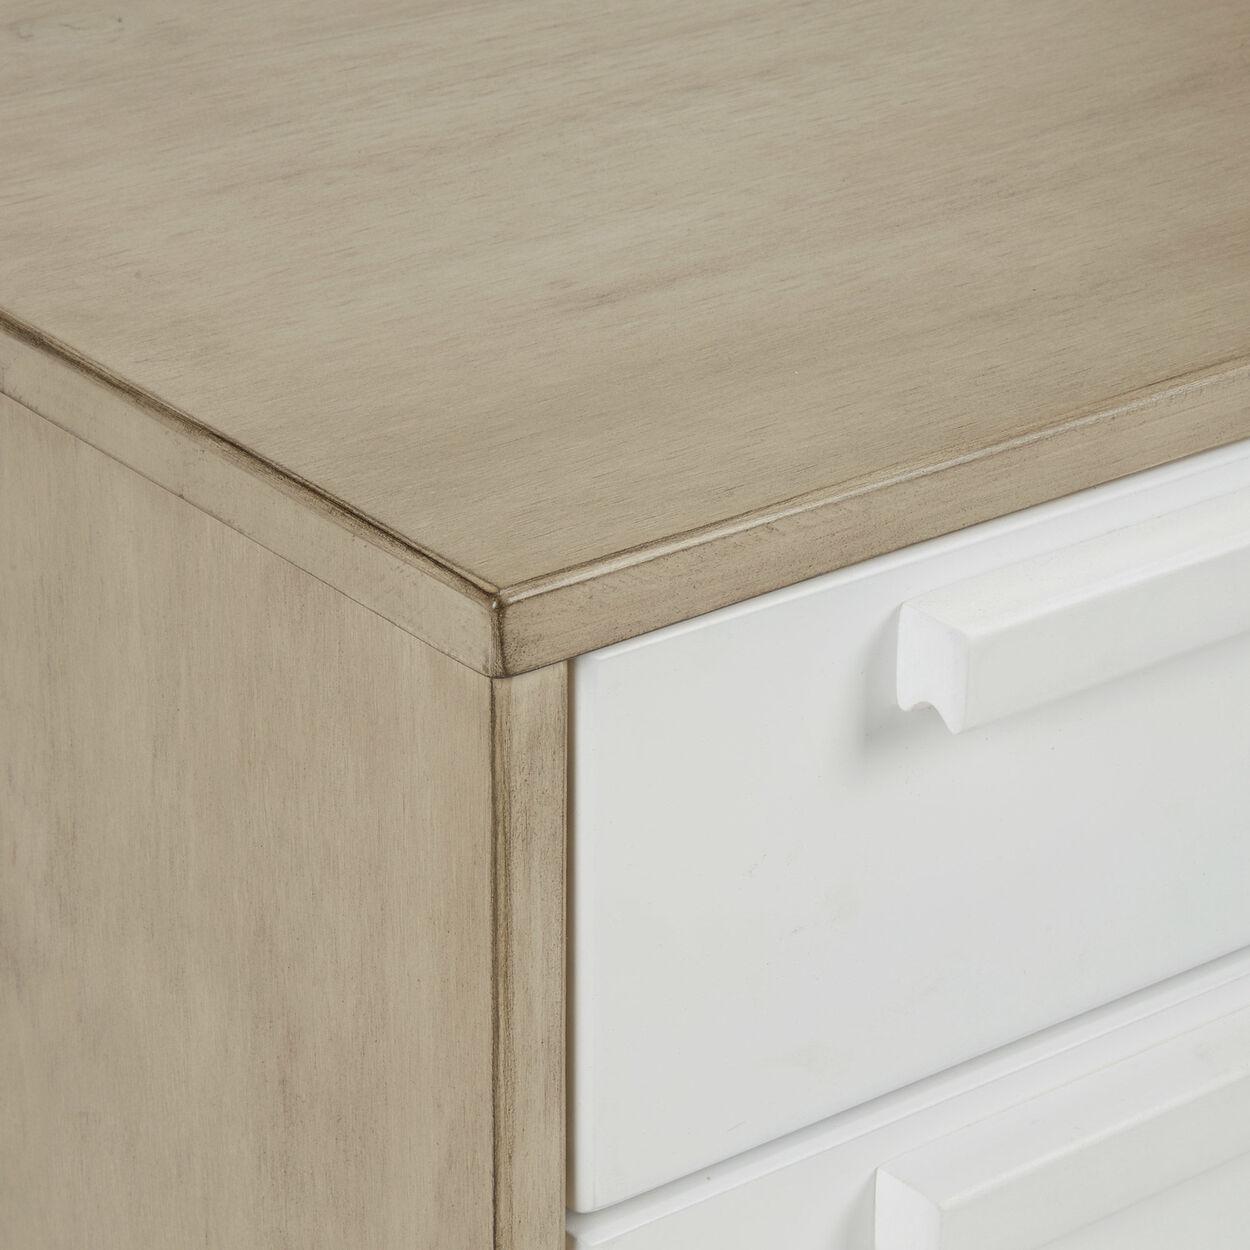 3-Drawer Wood Dresser